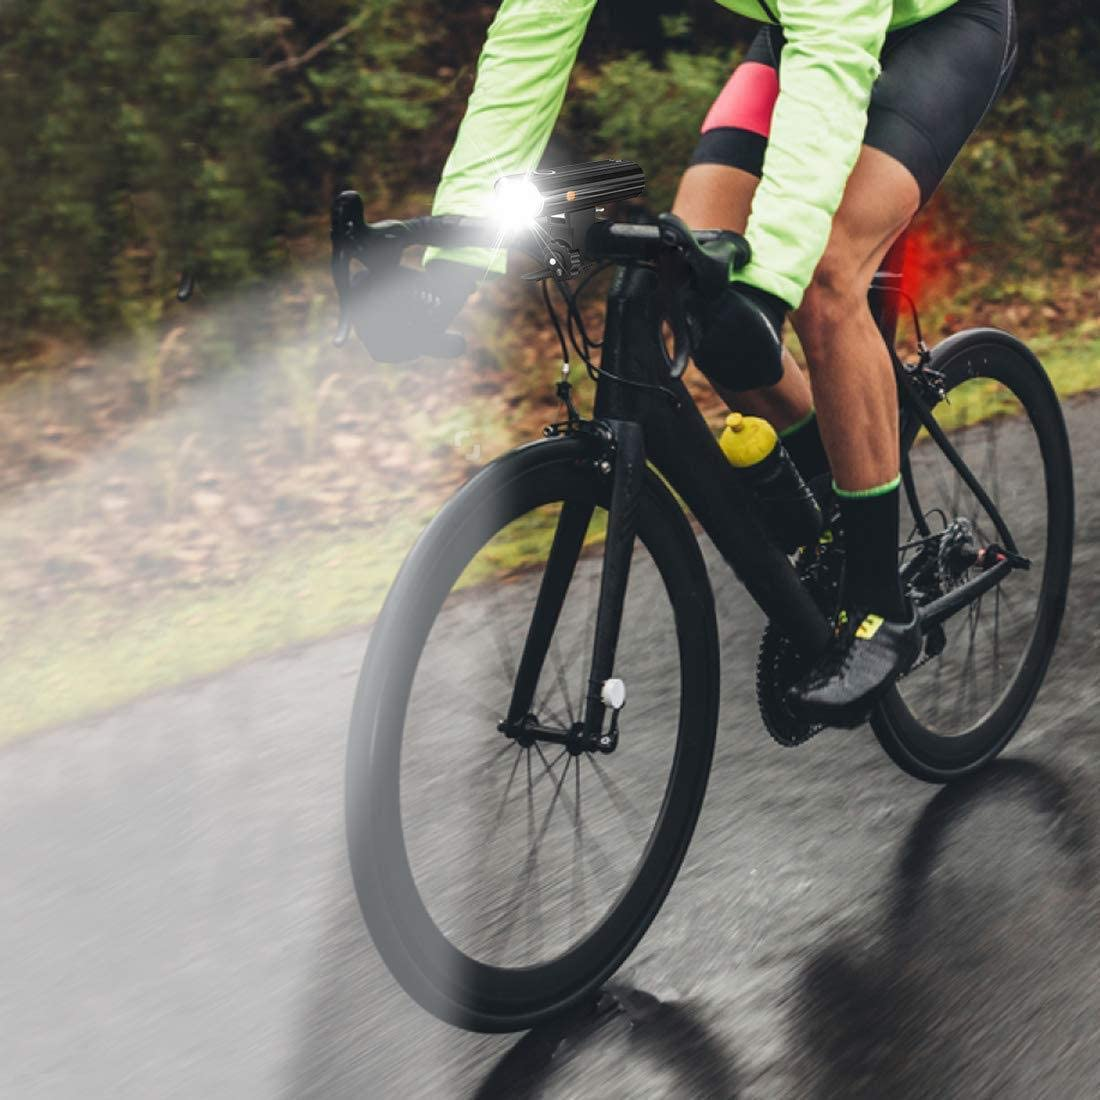 Nestling®Luz Bicicleta, Luces Bicicleta Recargable USB, Lámpara Bicicleta LED Impermeable, 800 Lúmenes Súper Potente, 5 Modos Iluminación, Luces Bicicleta Delantera y Trasera Kit: Amazon.es: Deportes y aire libre